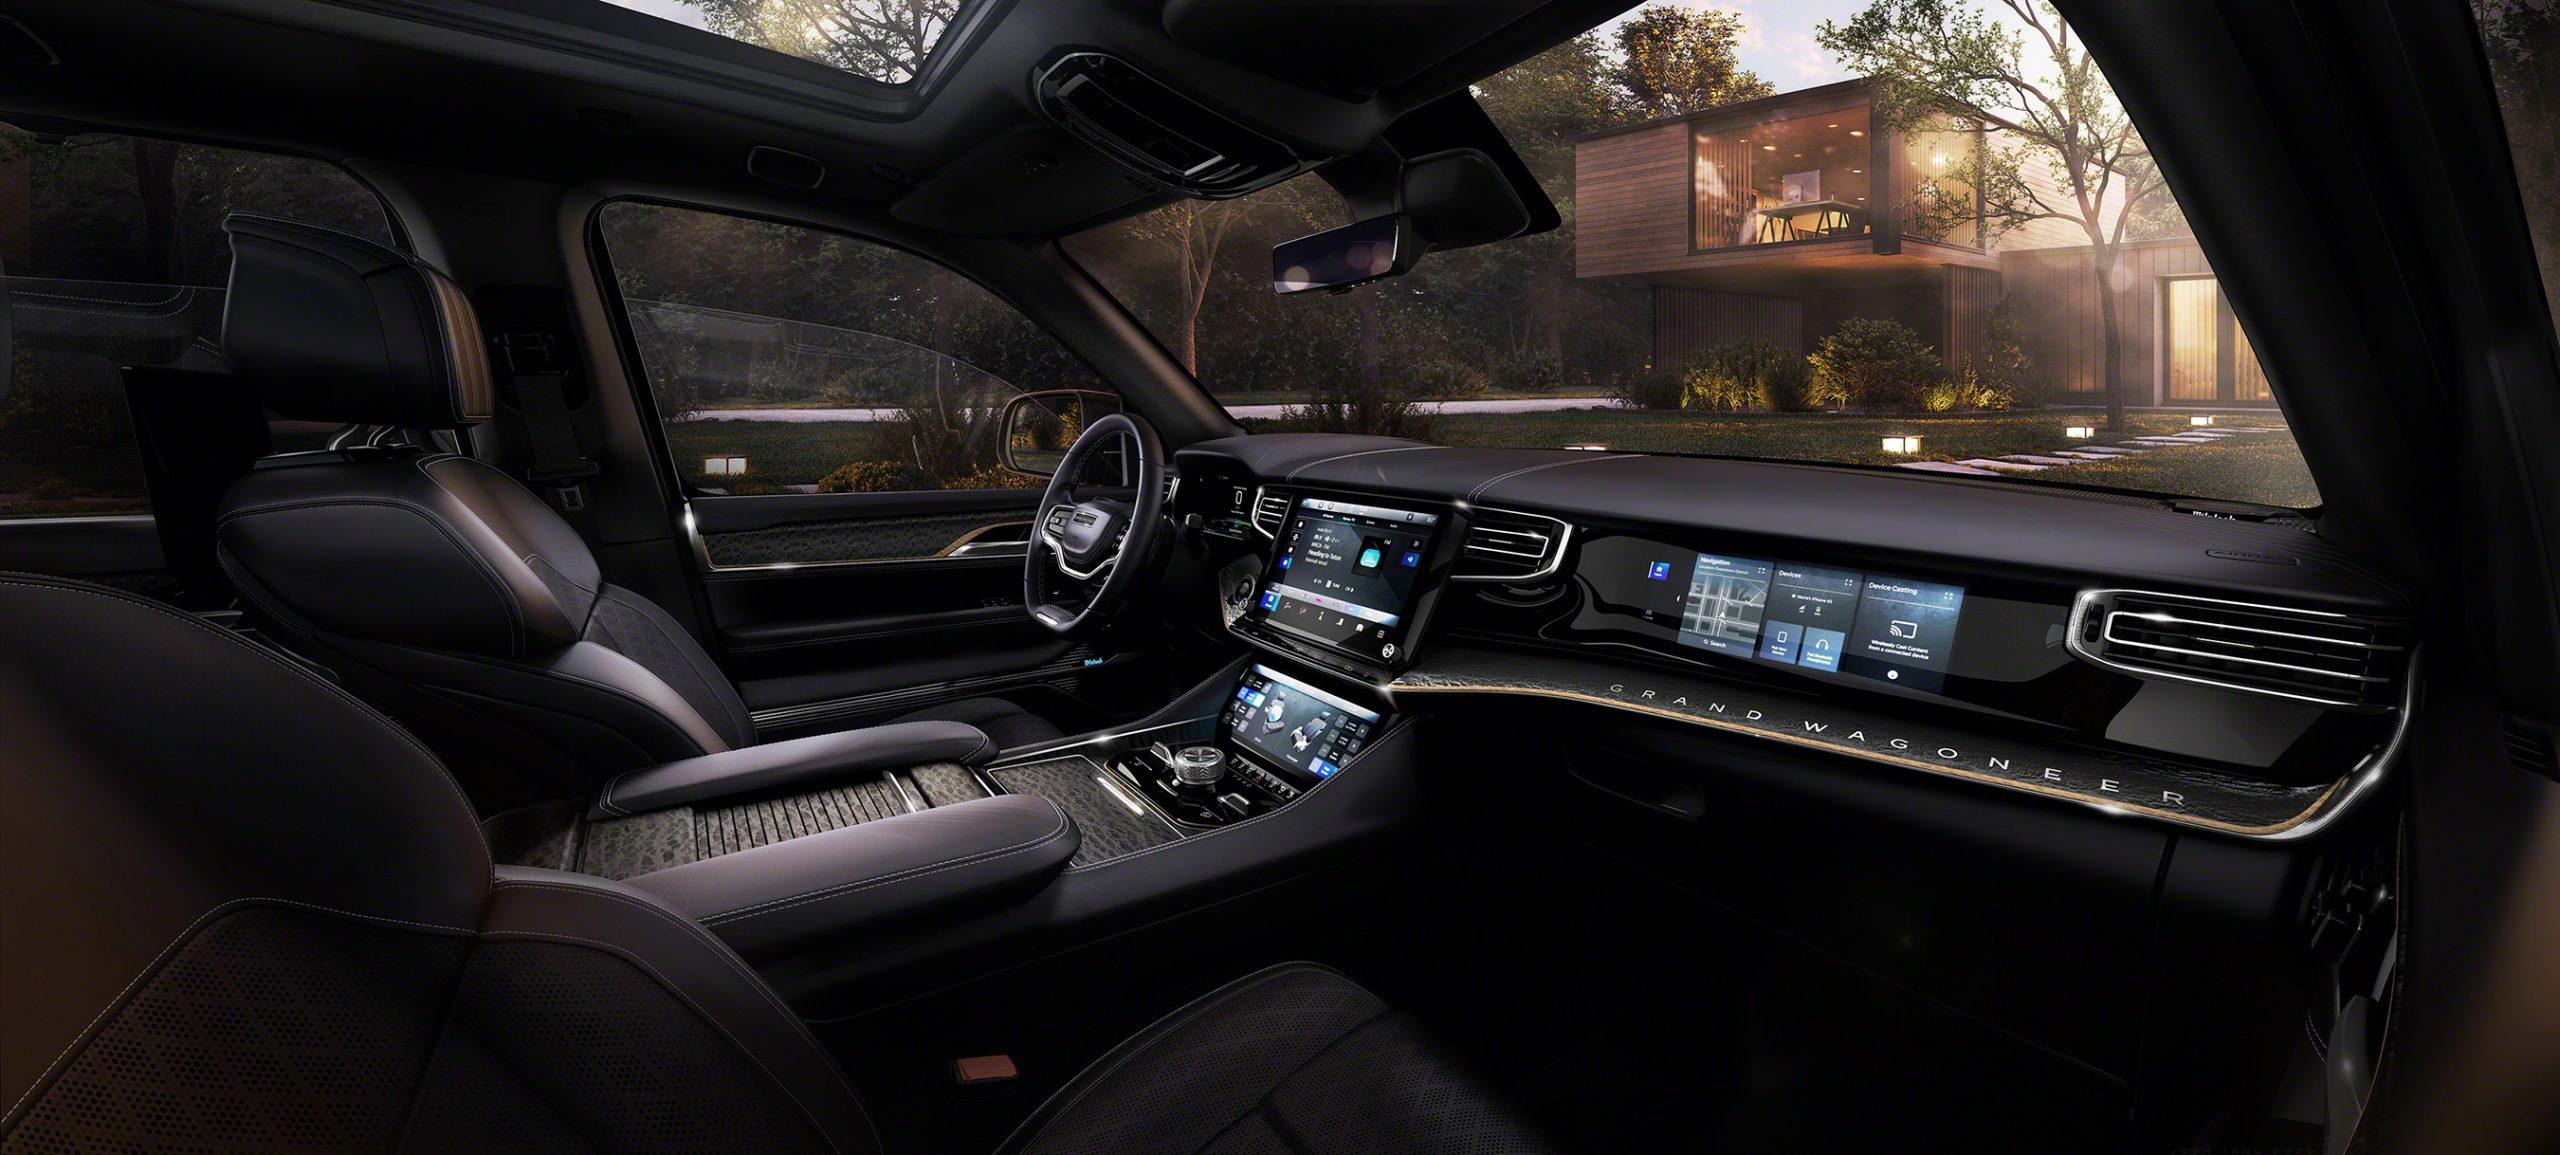 Grand Wagoneer Concept wide-angle interior shot